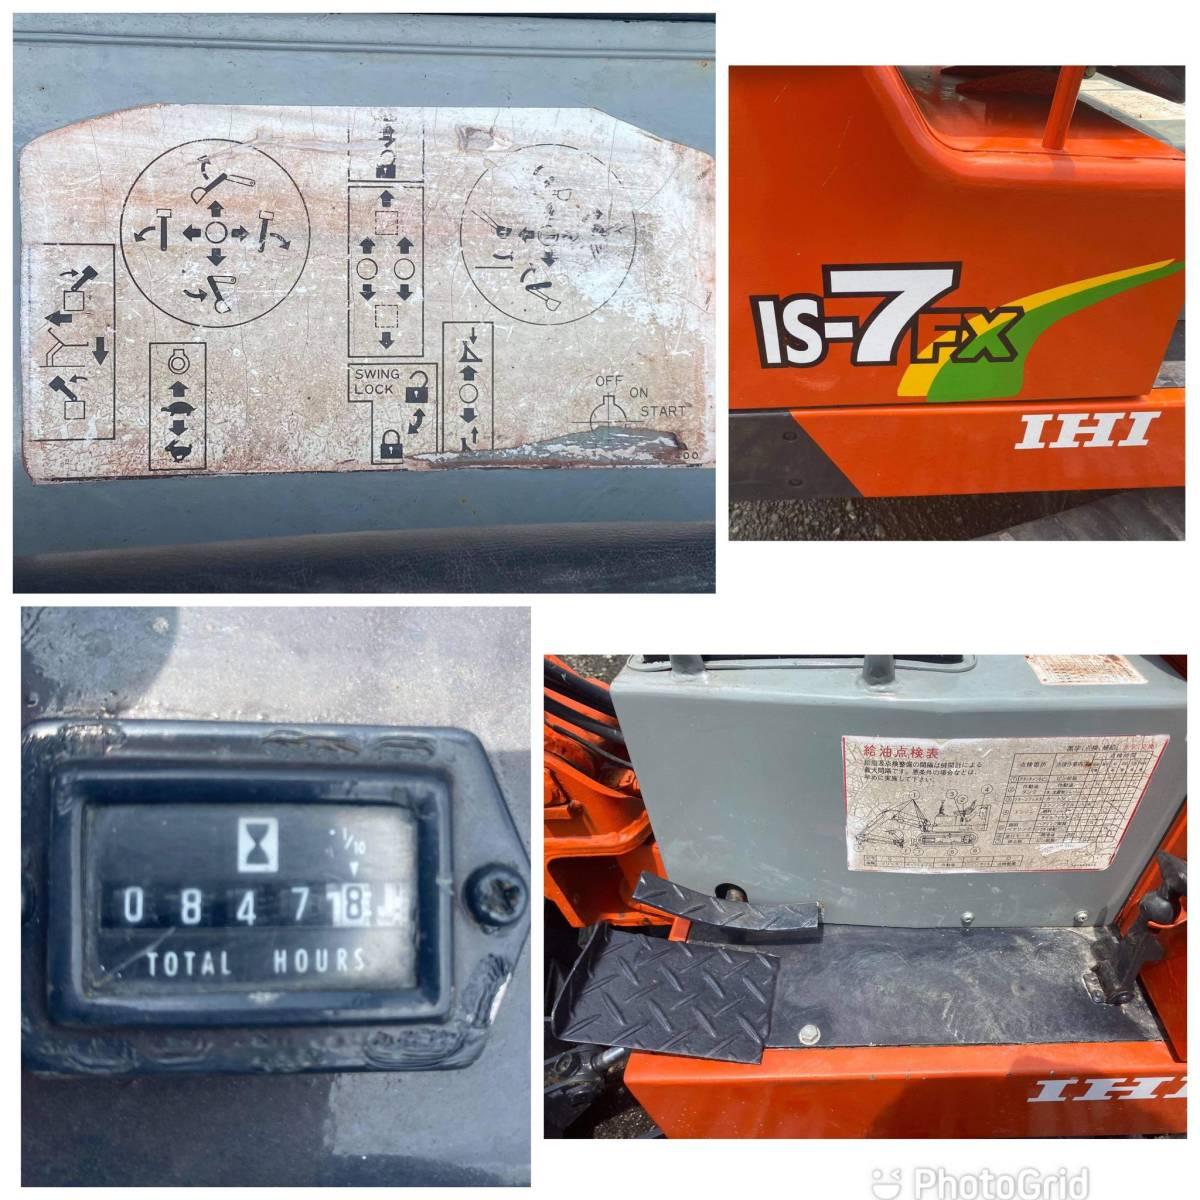 IHI 石川島建機 IS-7FX 油圧ショベル ミニユンボ Fシリーズ ディーゼルエンジン7馬力 使用時間847hr 再塗装済み、下取り可能、作動品。_画像10